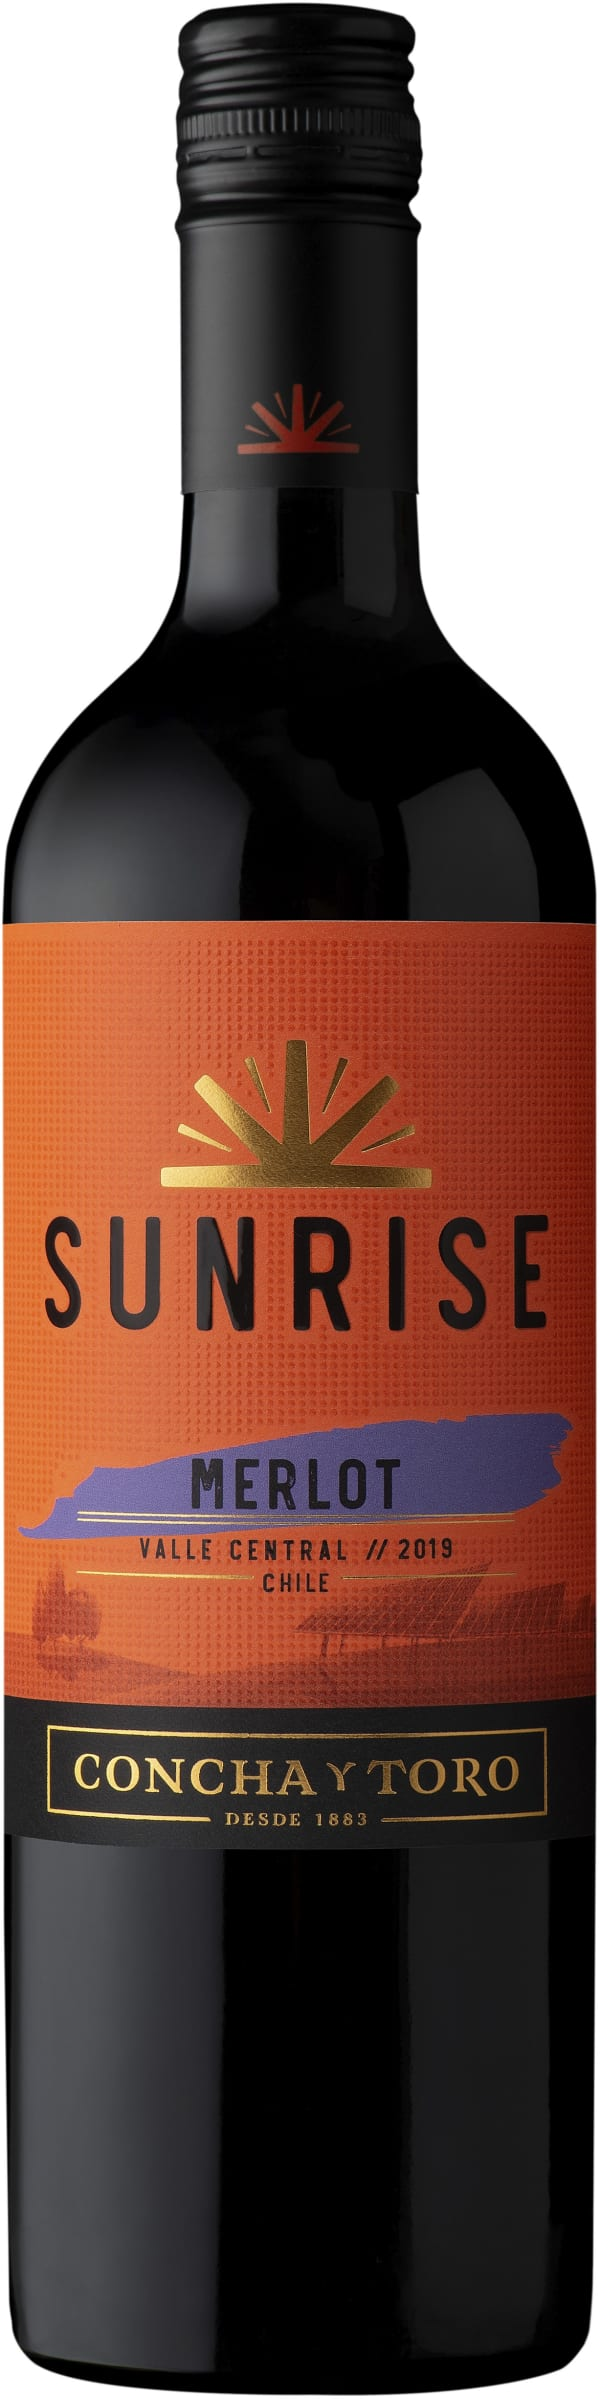 Sunrise Merlot 2018